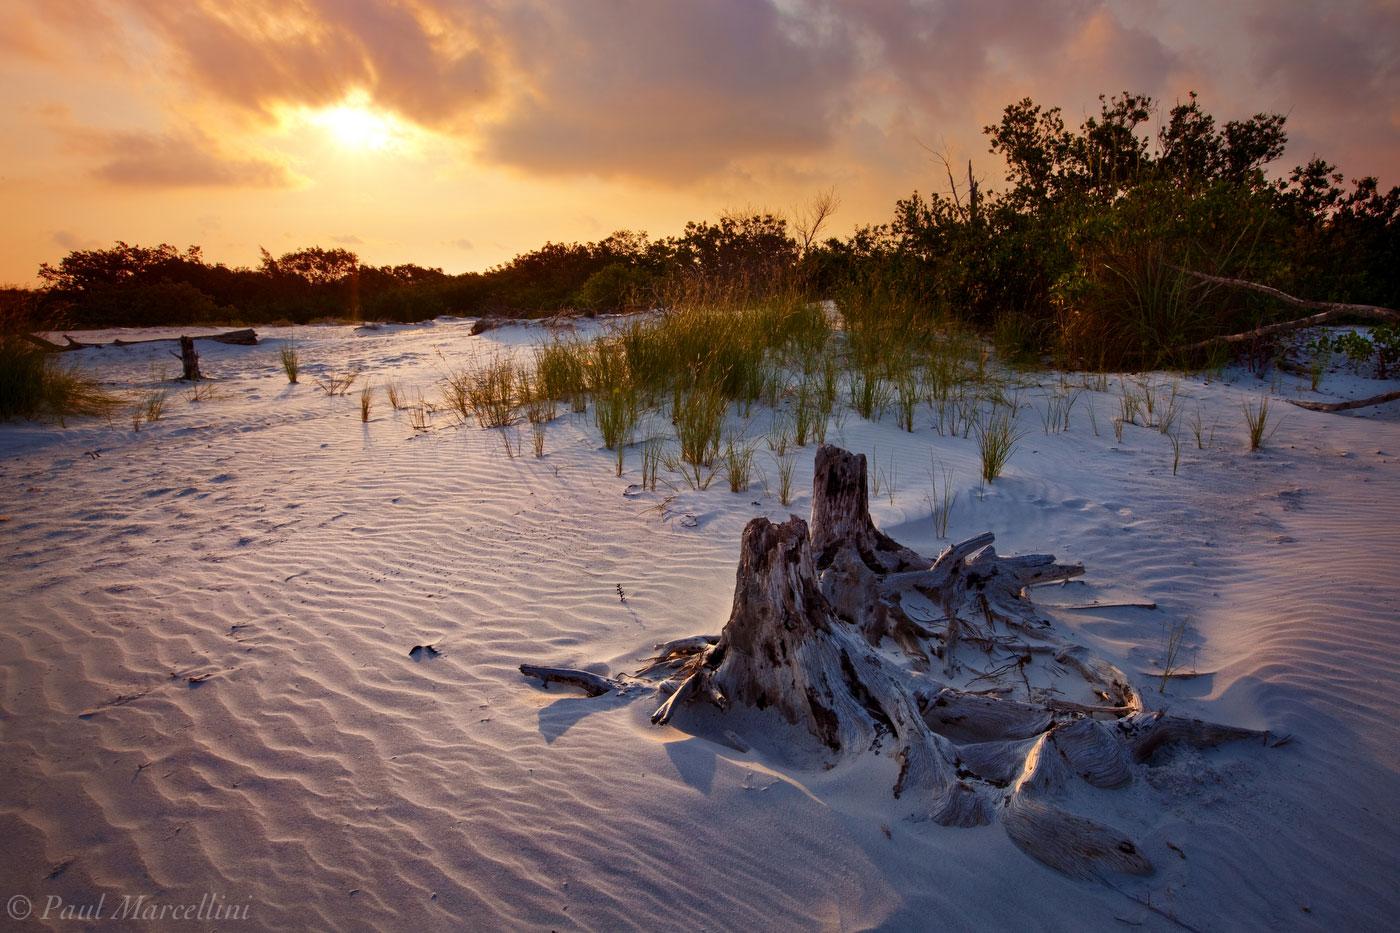 ft. desoto, beach, sunrise, florida, south florida, nature, photography, ft desoto, fort desoto, desoto, photo